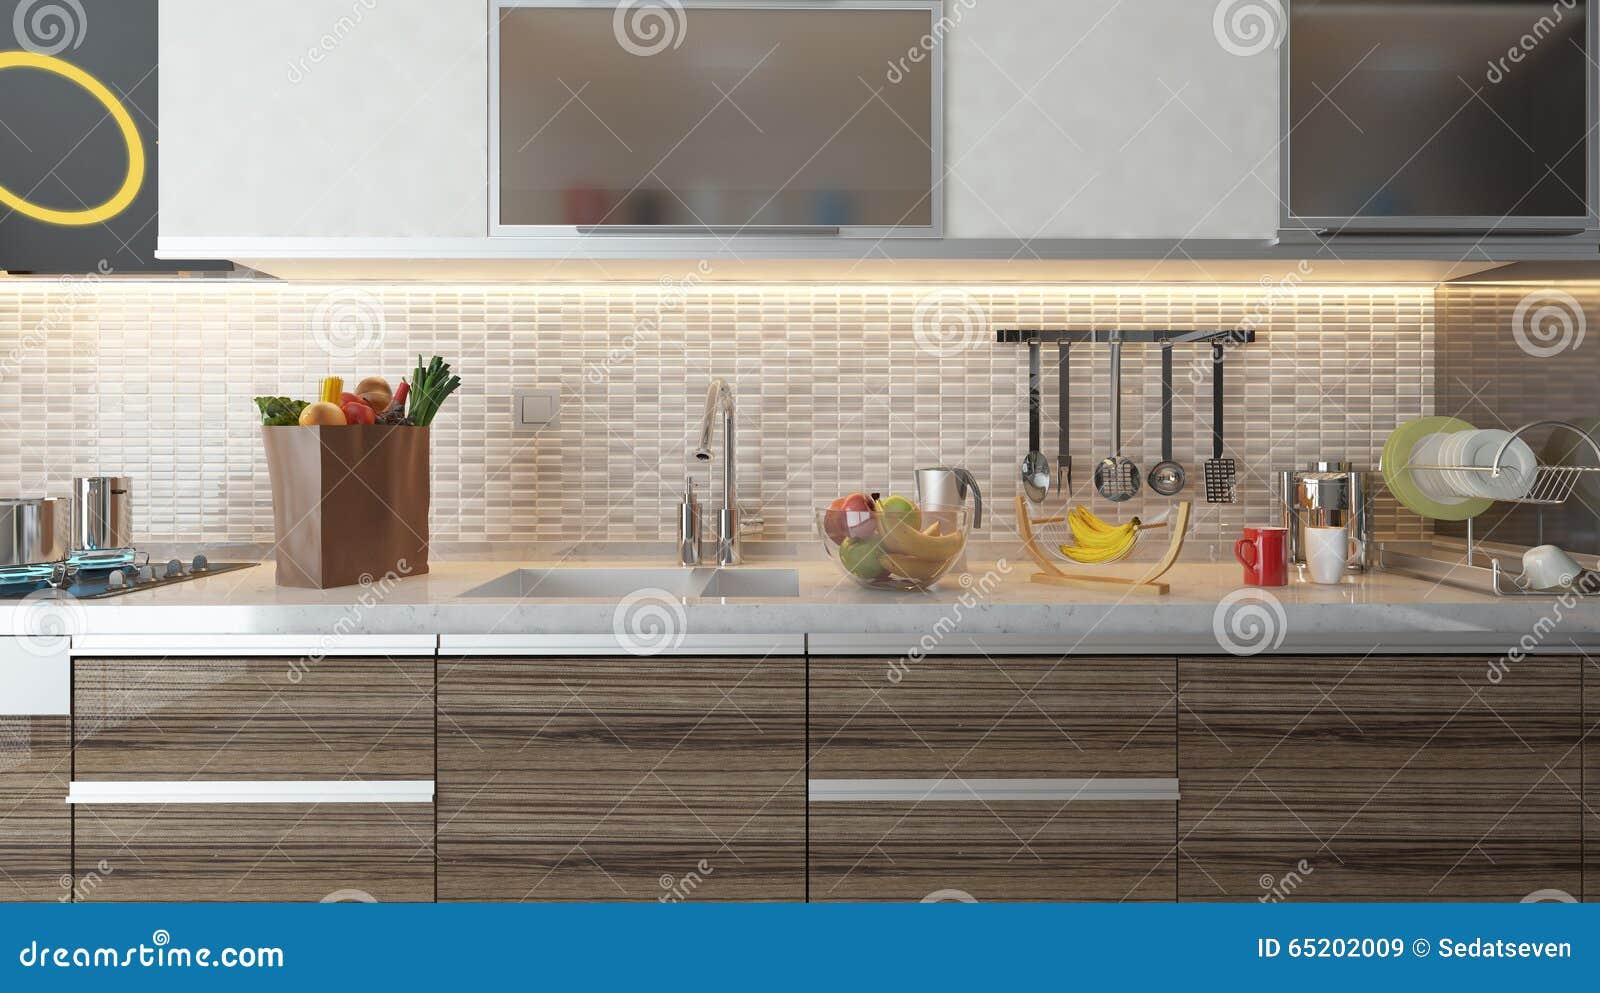 Dise o interior de la cocina moderna con la pared de for Ceramicas para cocinas modernas